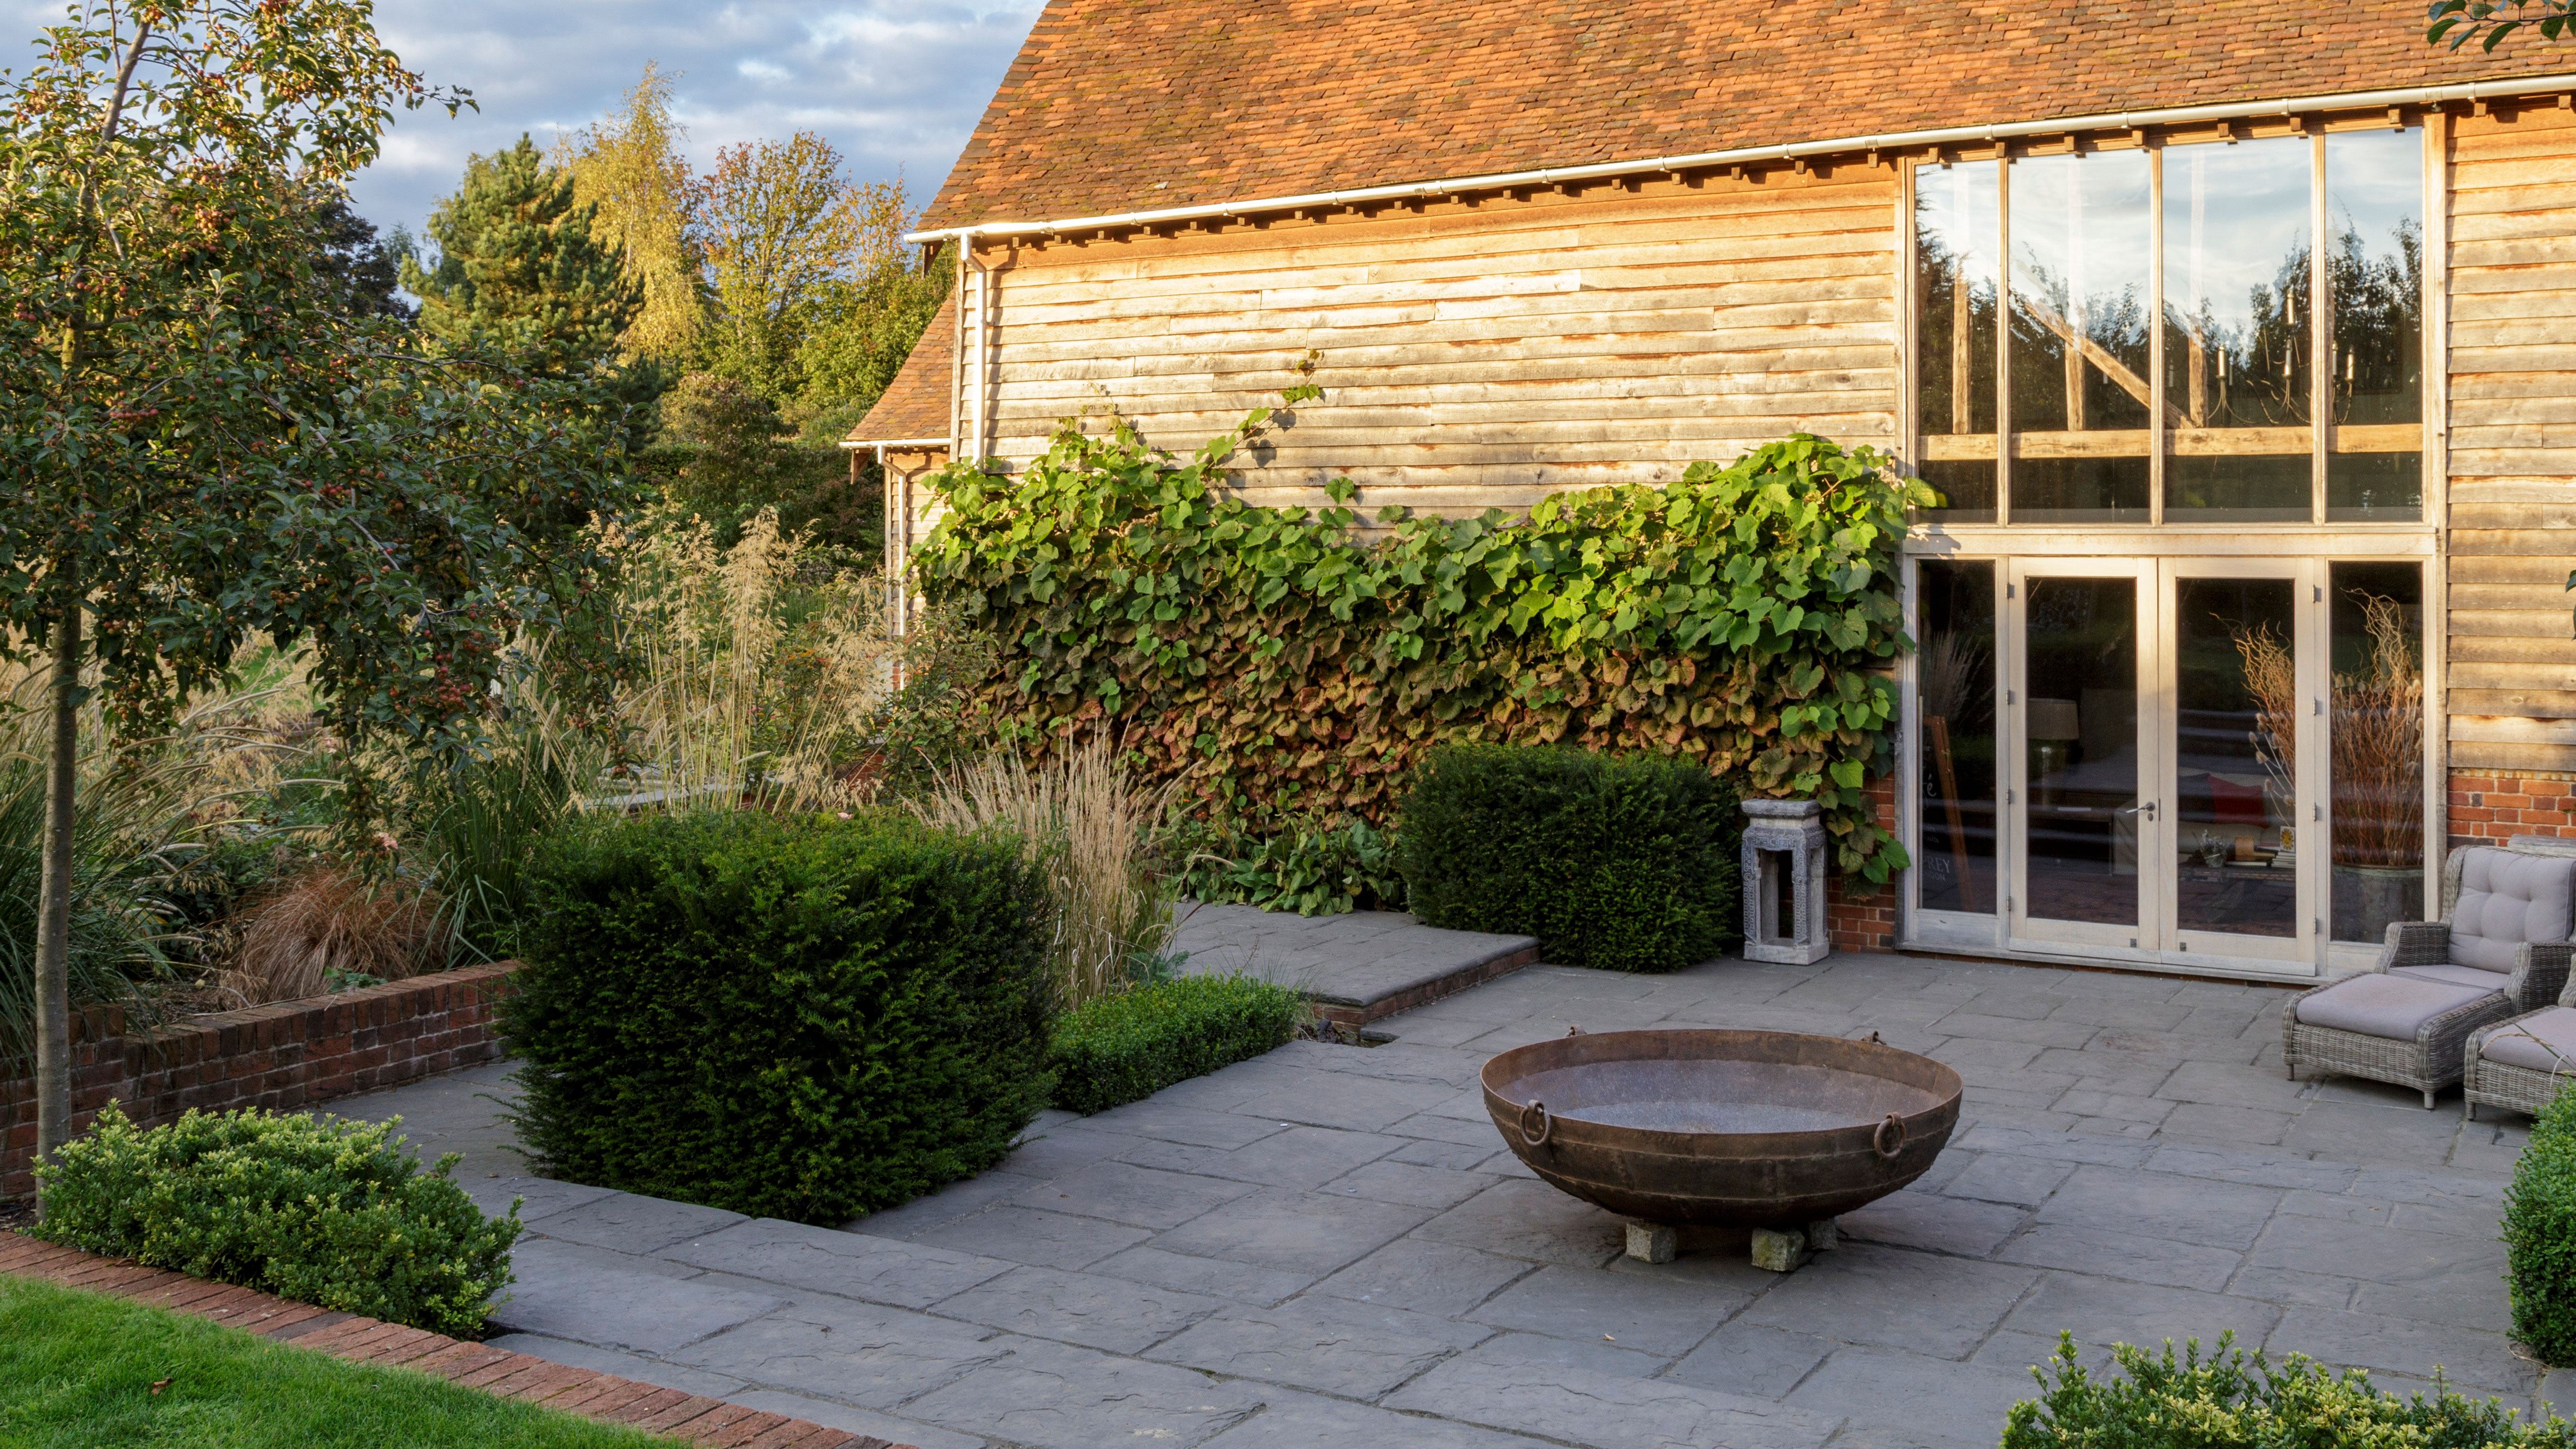 Courtyard garden ideas Transform a small or awkwardly shaped ...